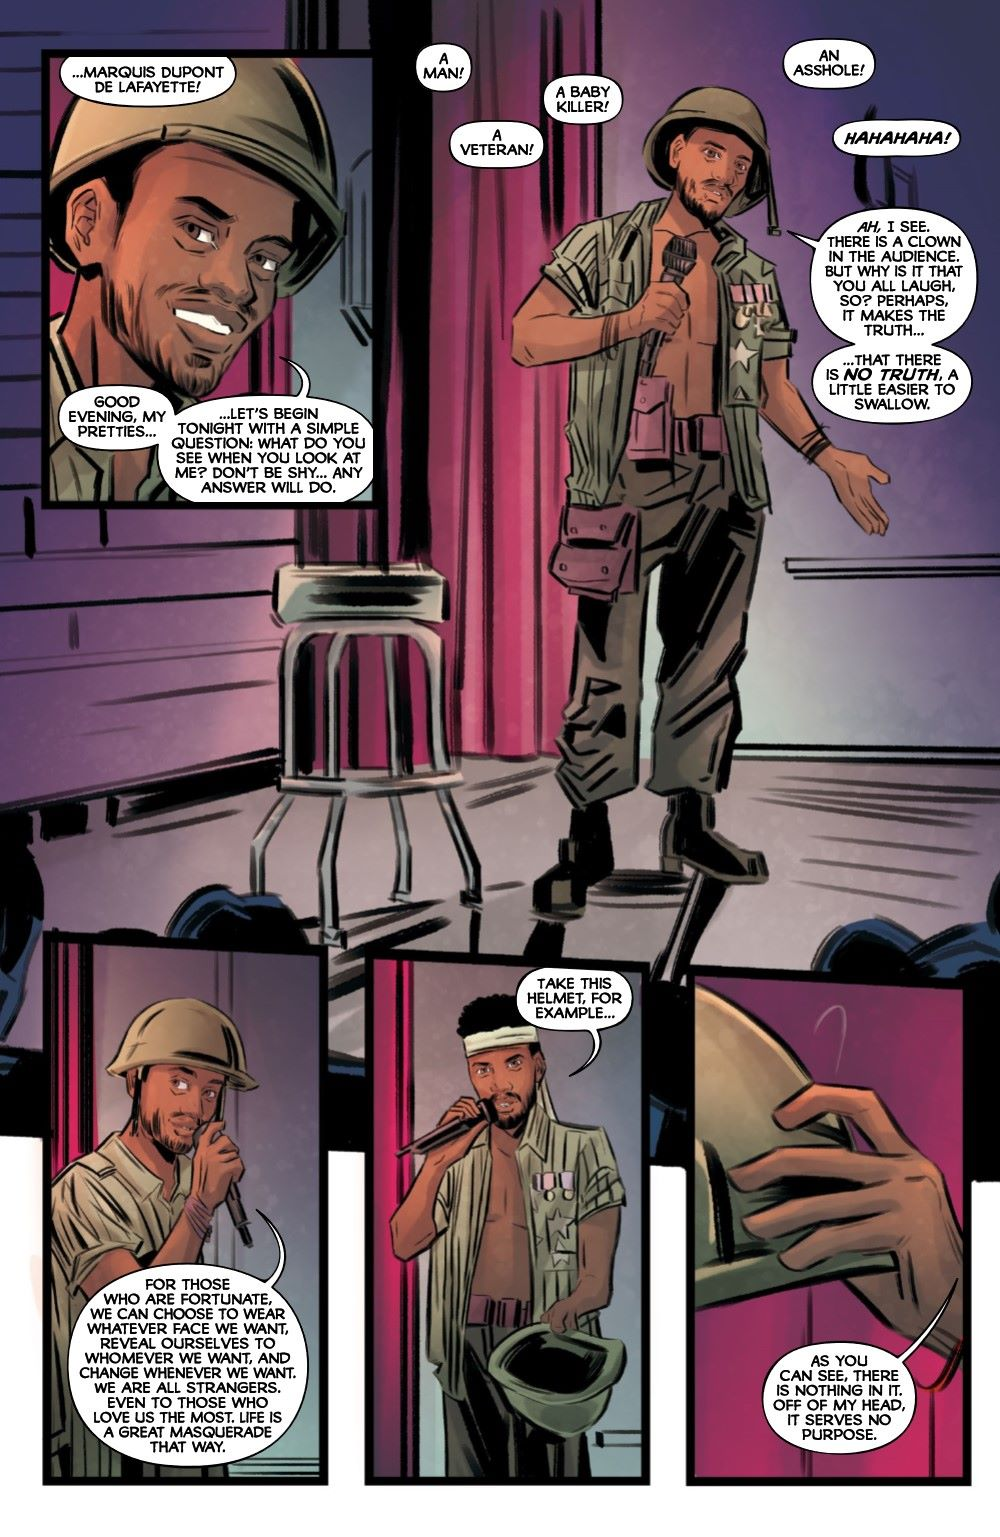 VAIN-4-MARKETING-06 ComicList Previews: THE VAIN #4